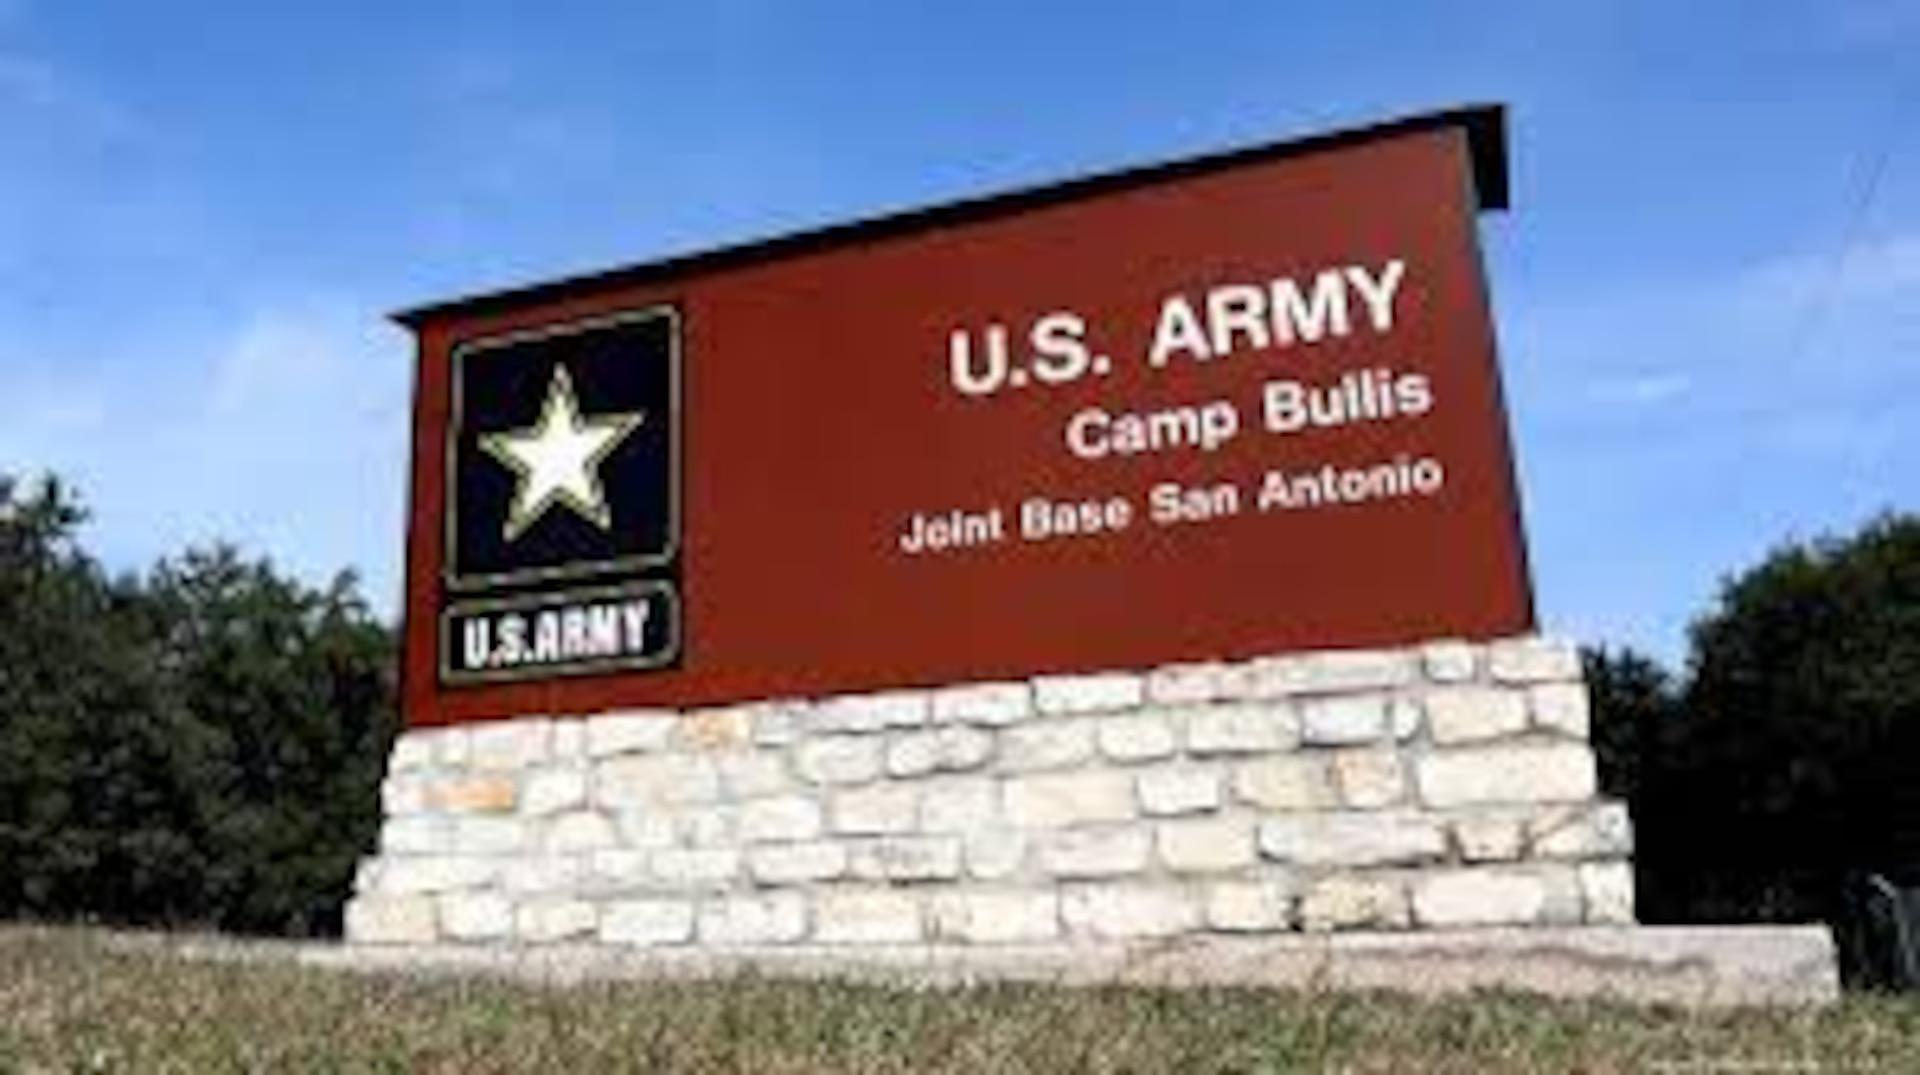 Signage for Joint Base San Antonio-Camp Bullis.